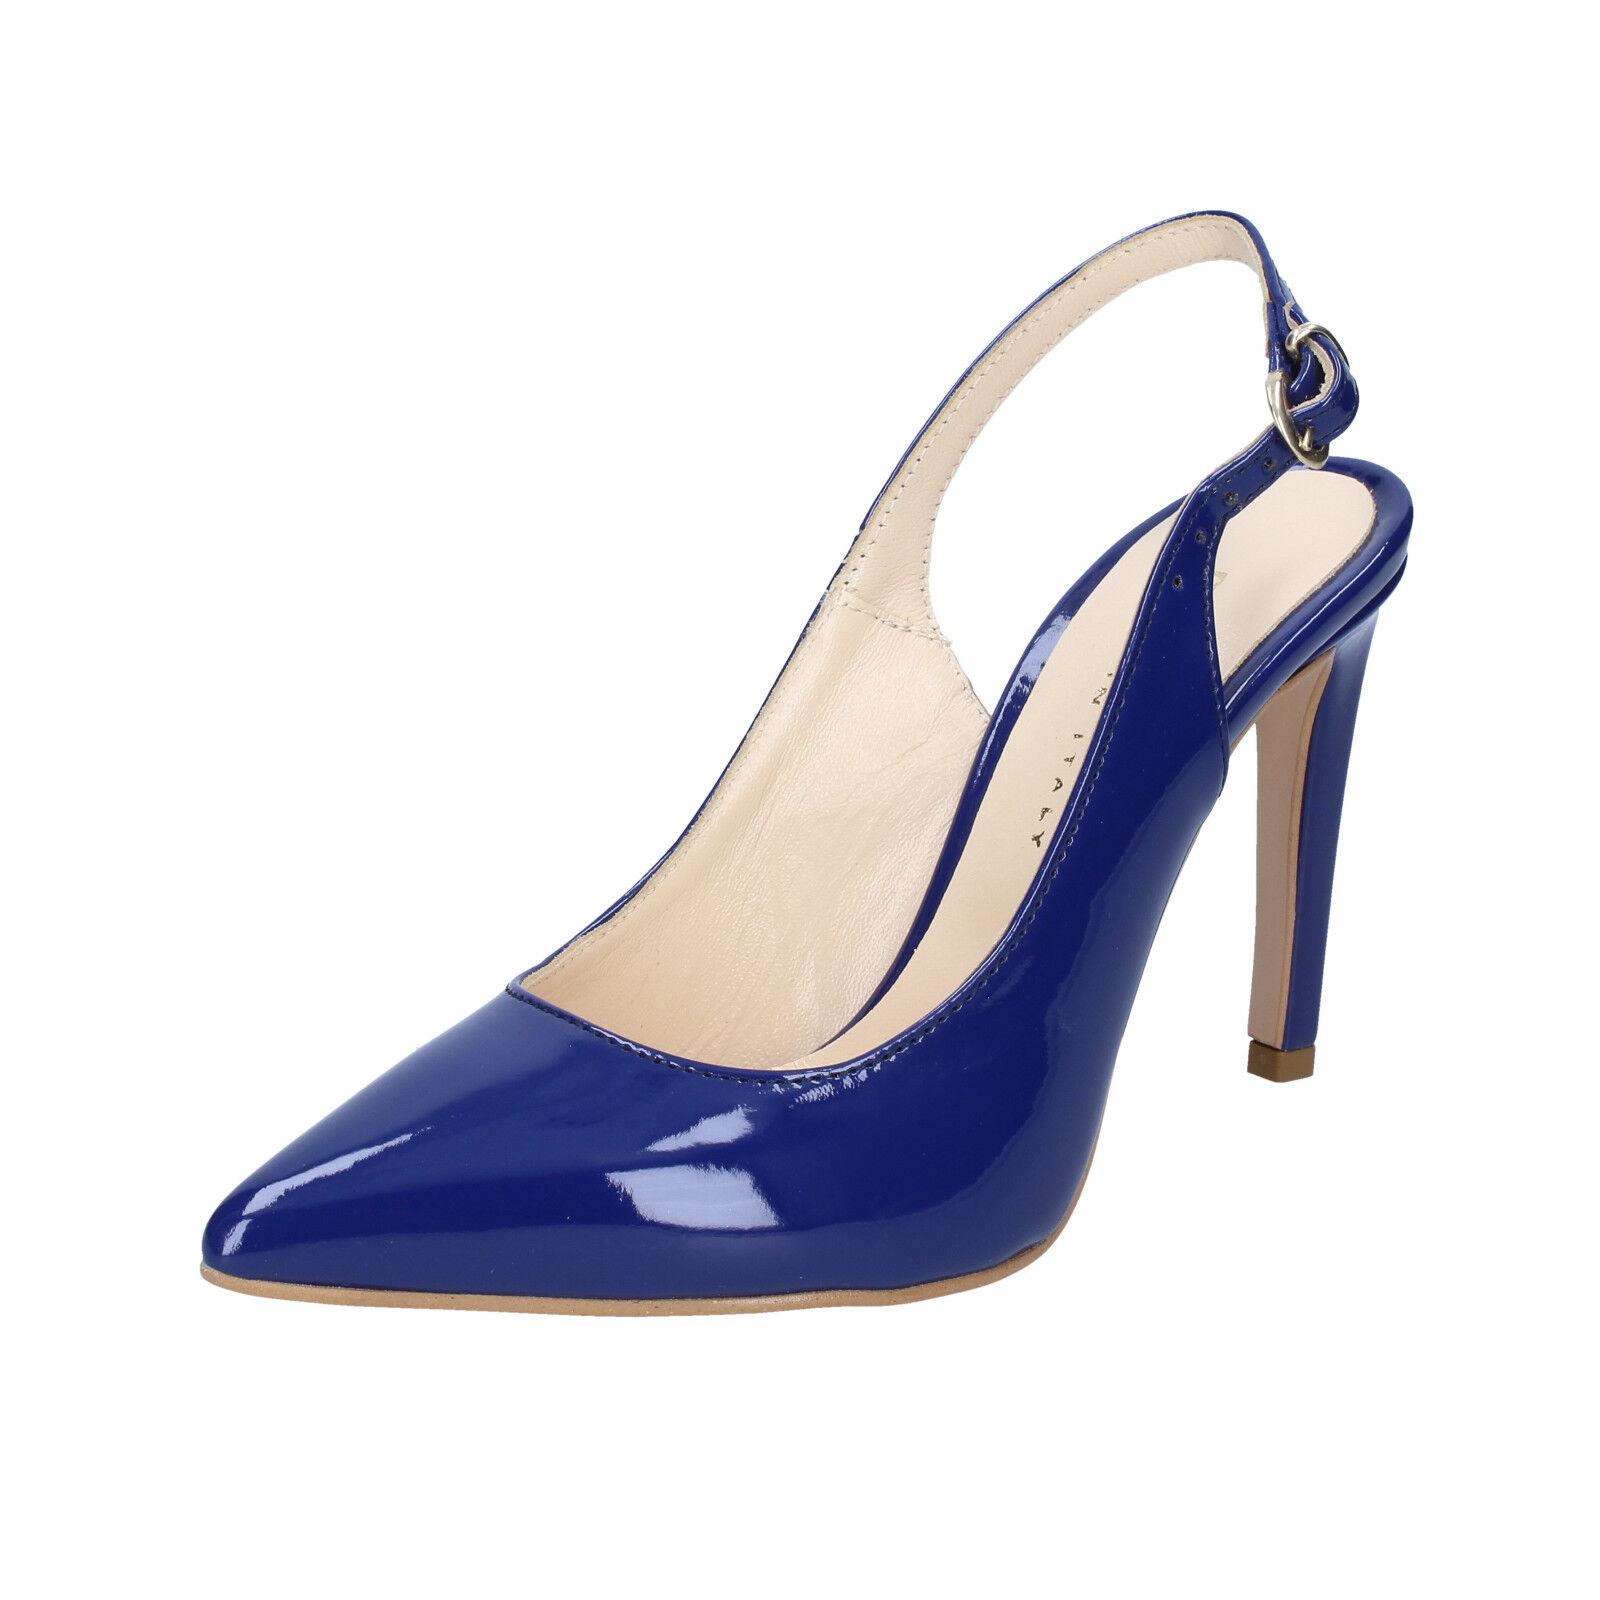 vendita online Scarpe donna OLGA RUBINI RUBINI RUBINI 39 EU decolte blu vernice BS94-39  design semplice e generoso